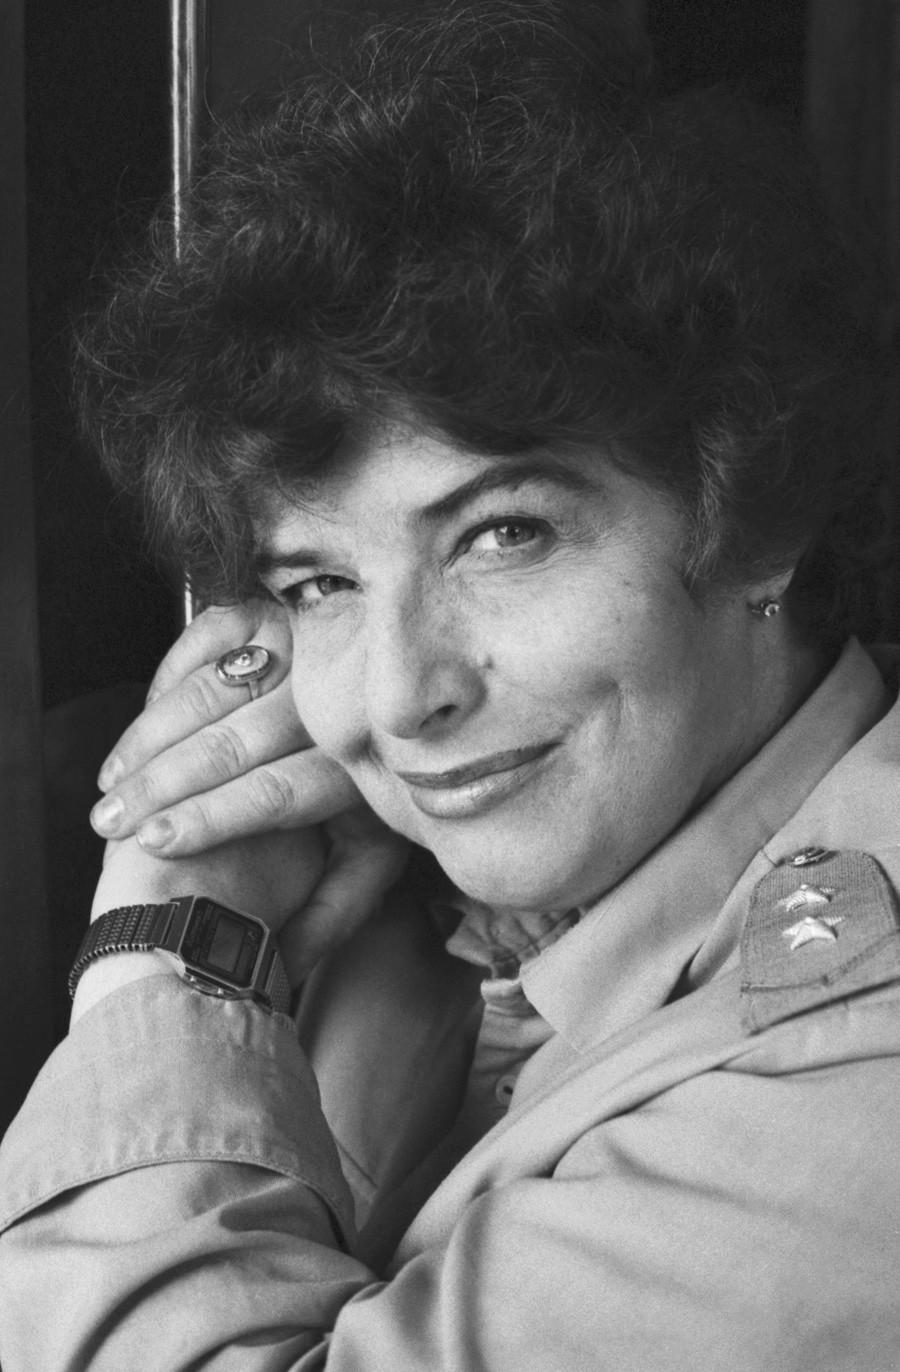 Zugführerin Tamara Arantschij, 1989